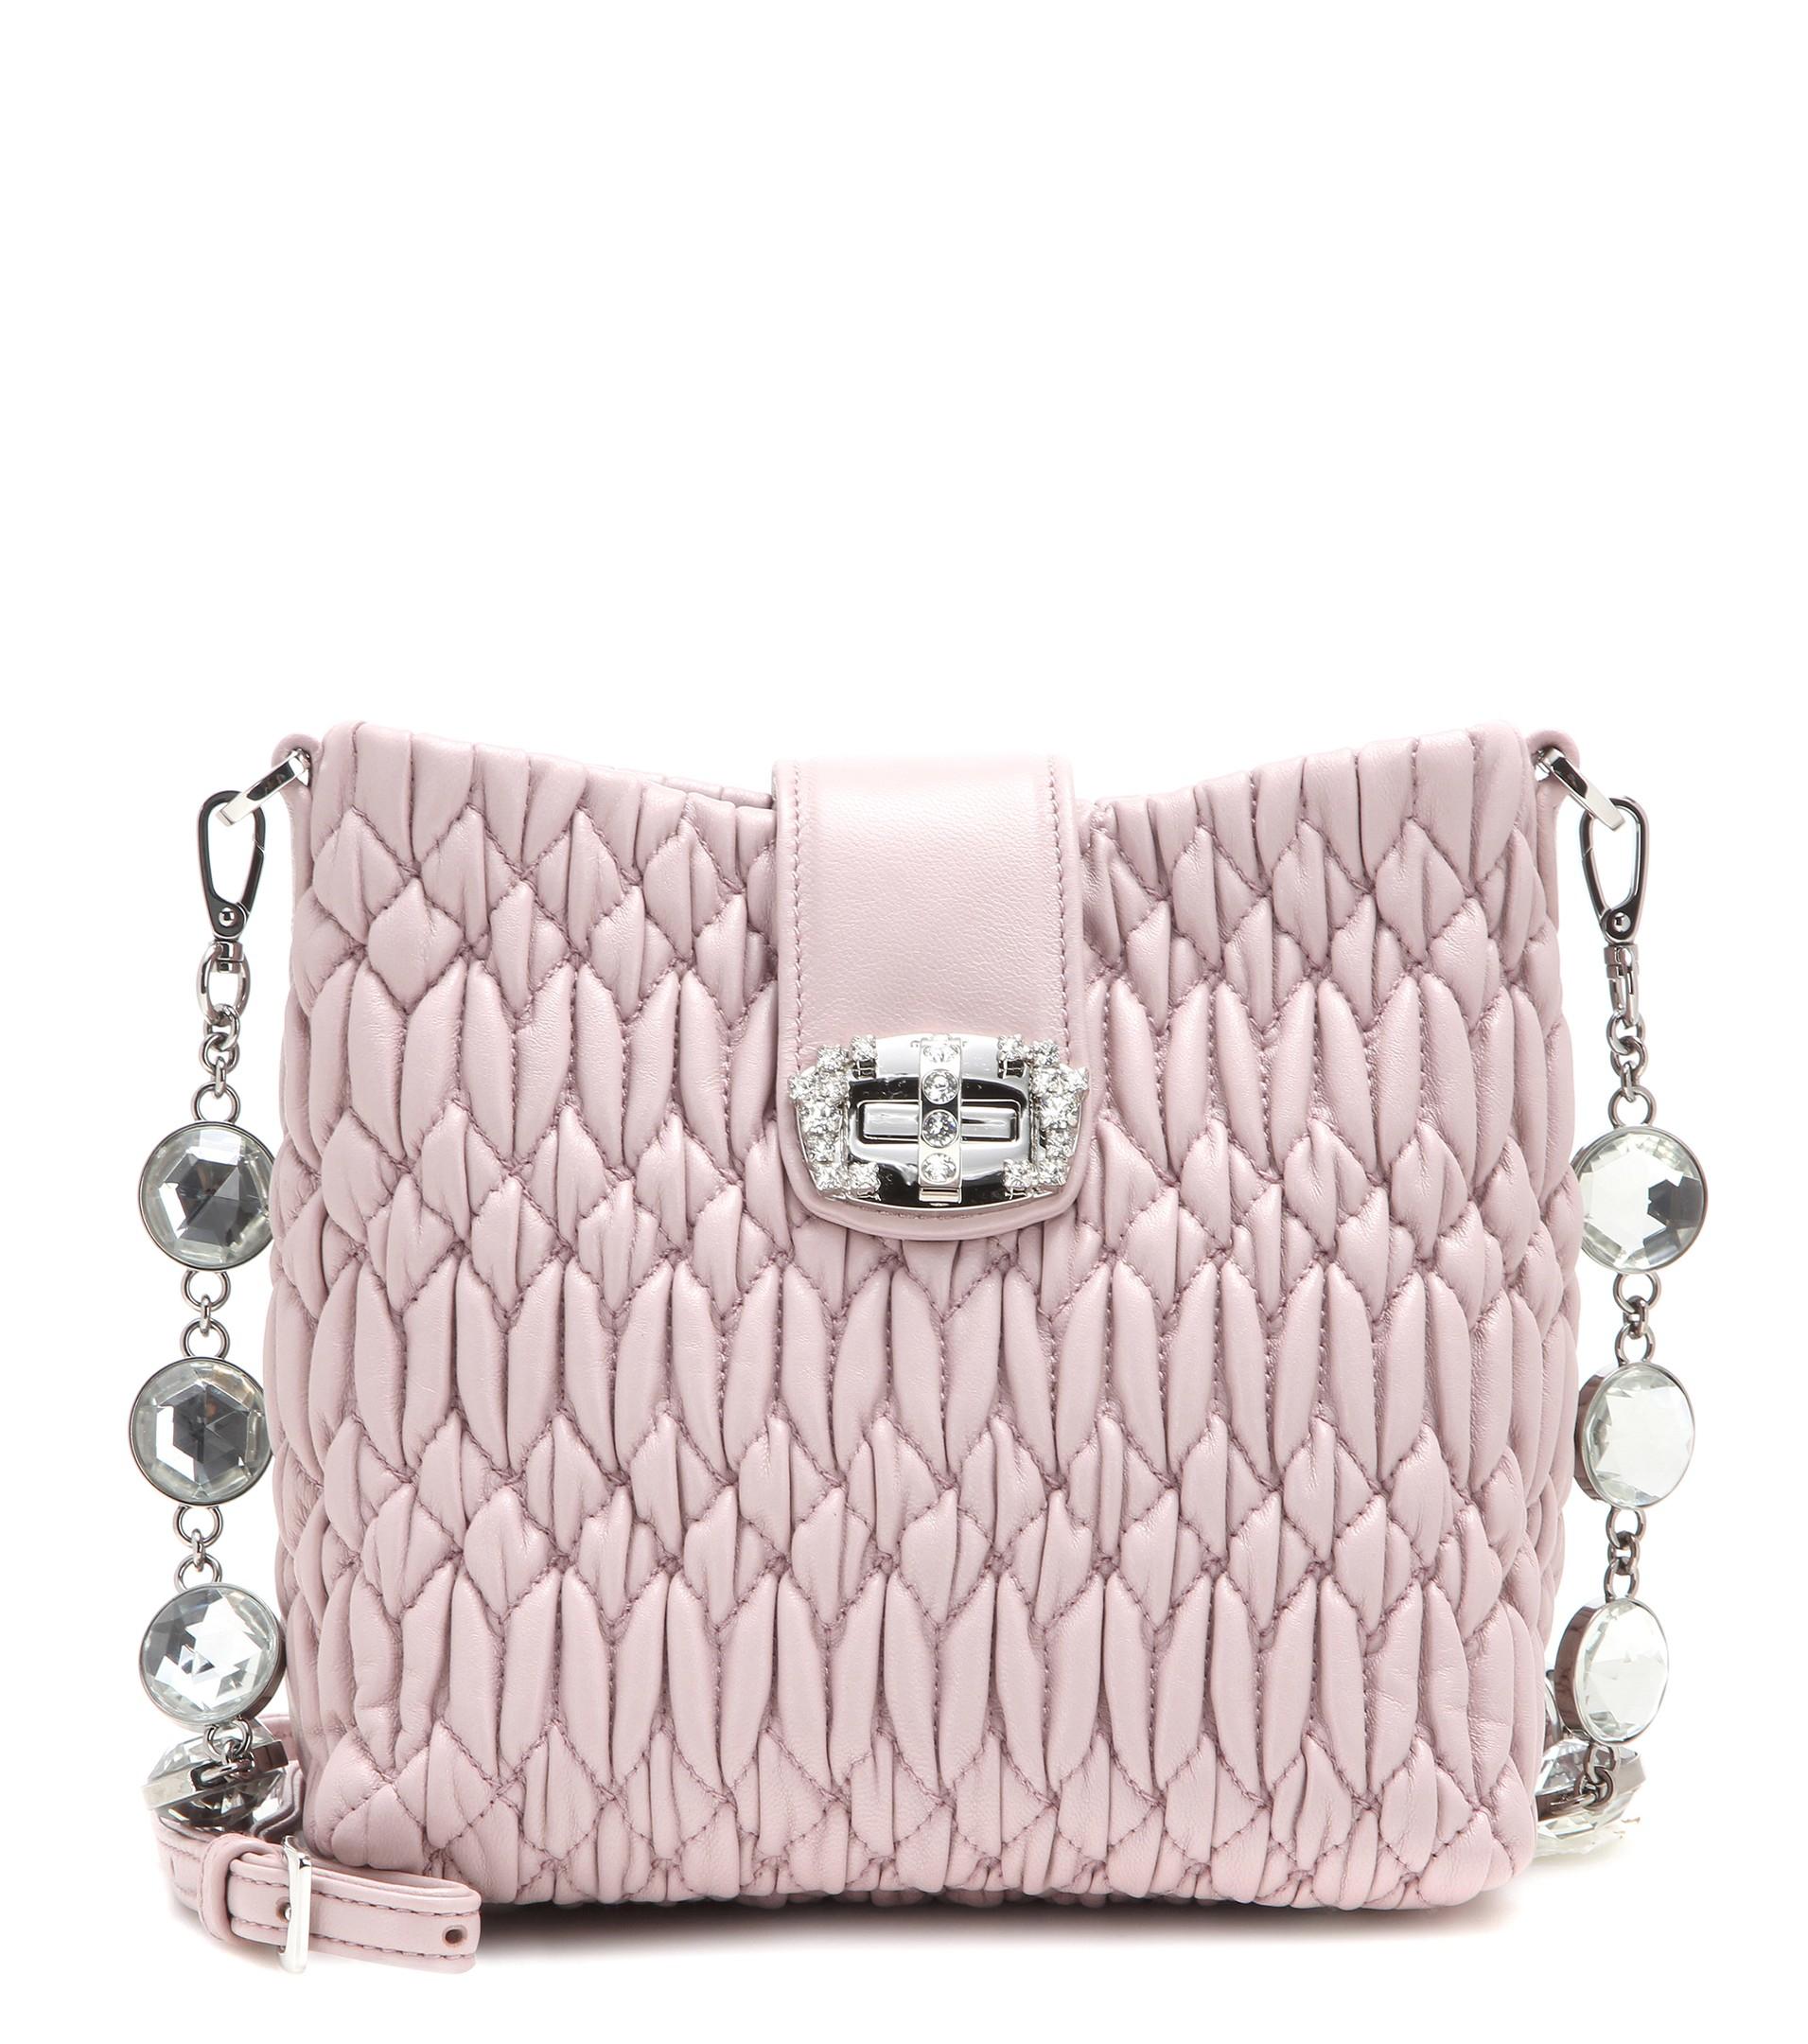 Miu Miu Matelassé Leather Shoulder Bag in Pink - Lyst 21eb8f90ce0d0